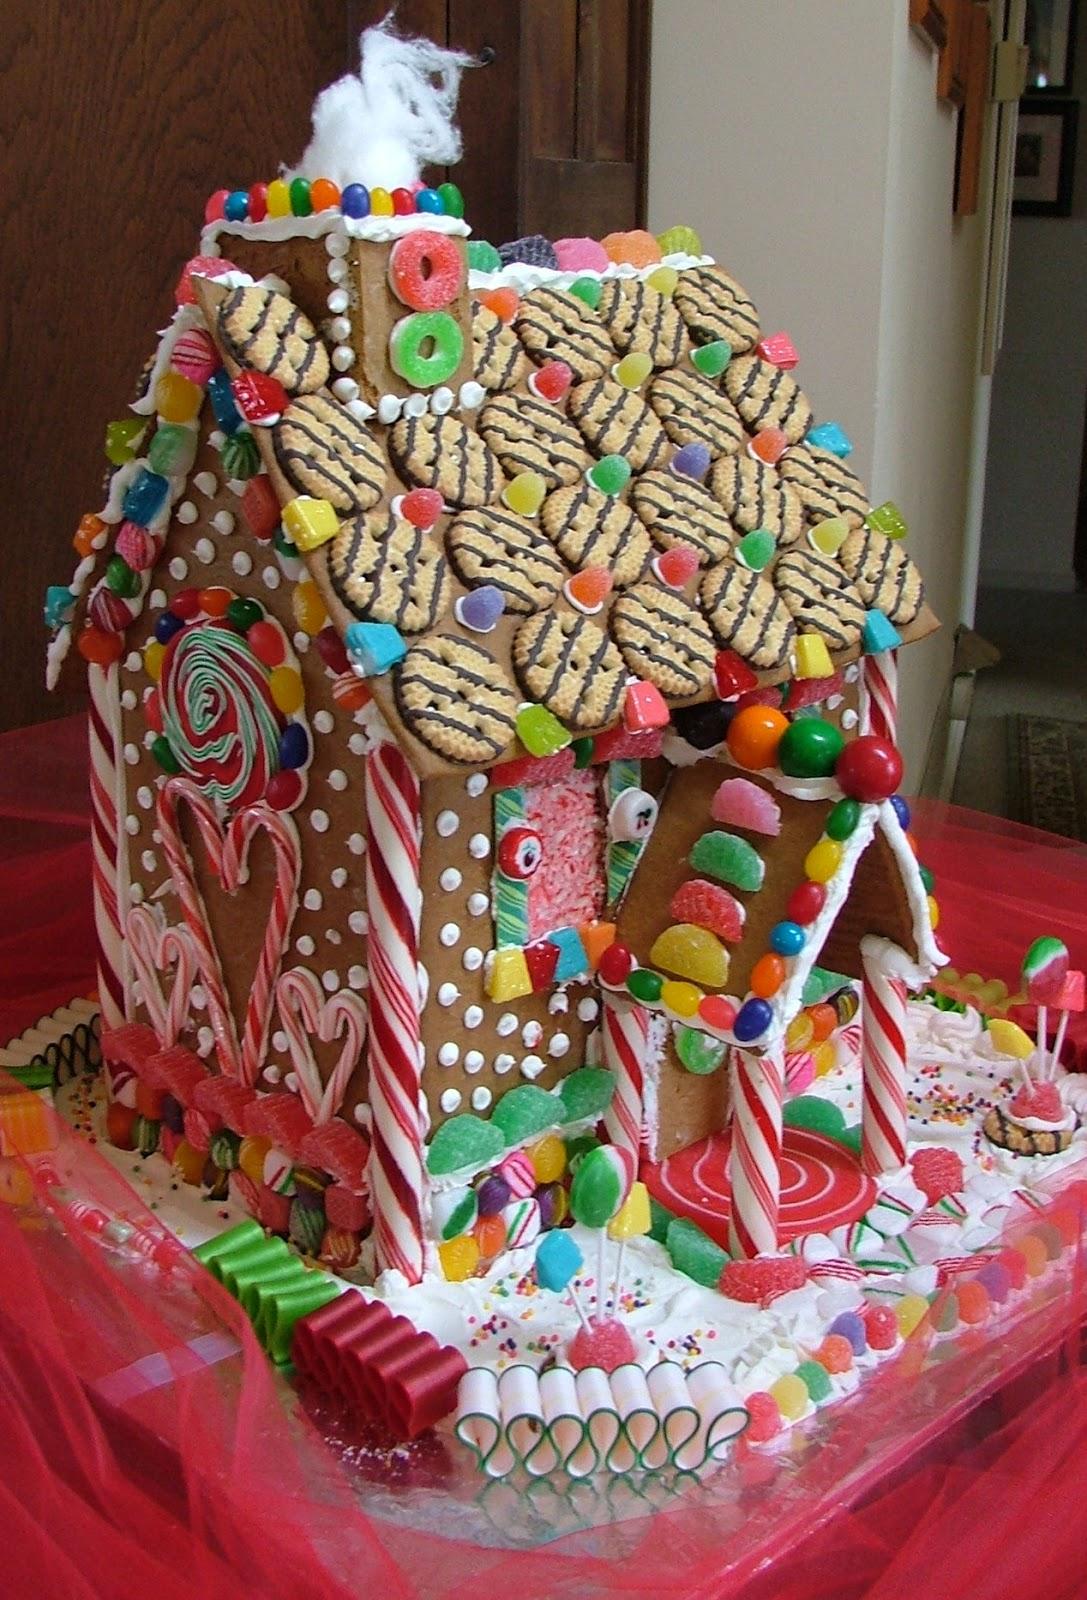 suzy homefaker gingerbread house decorating ideas. Black Bedroom Furniture Sets. Home Design Ideas